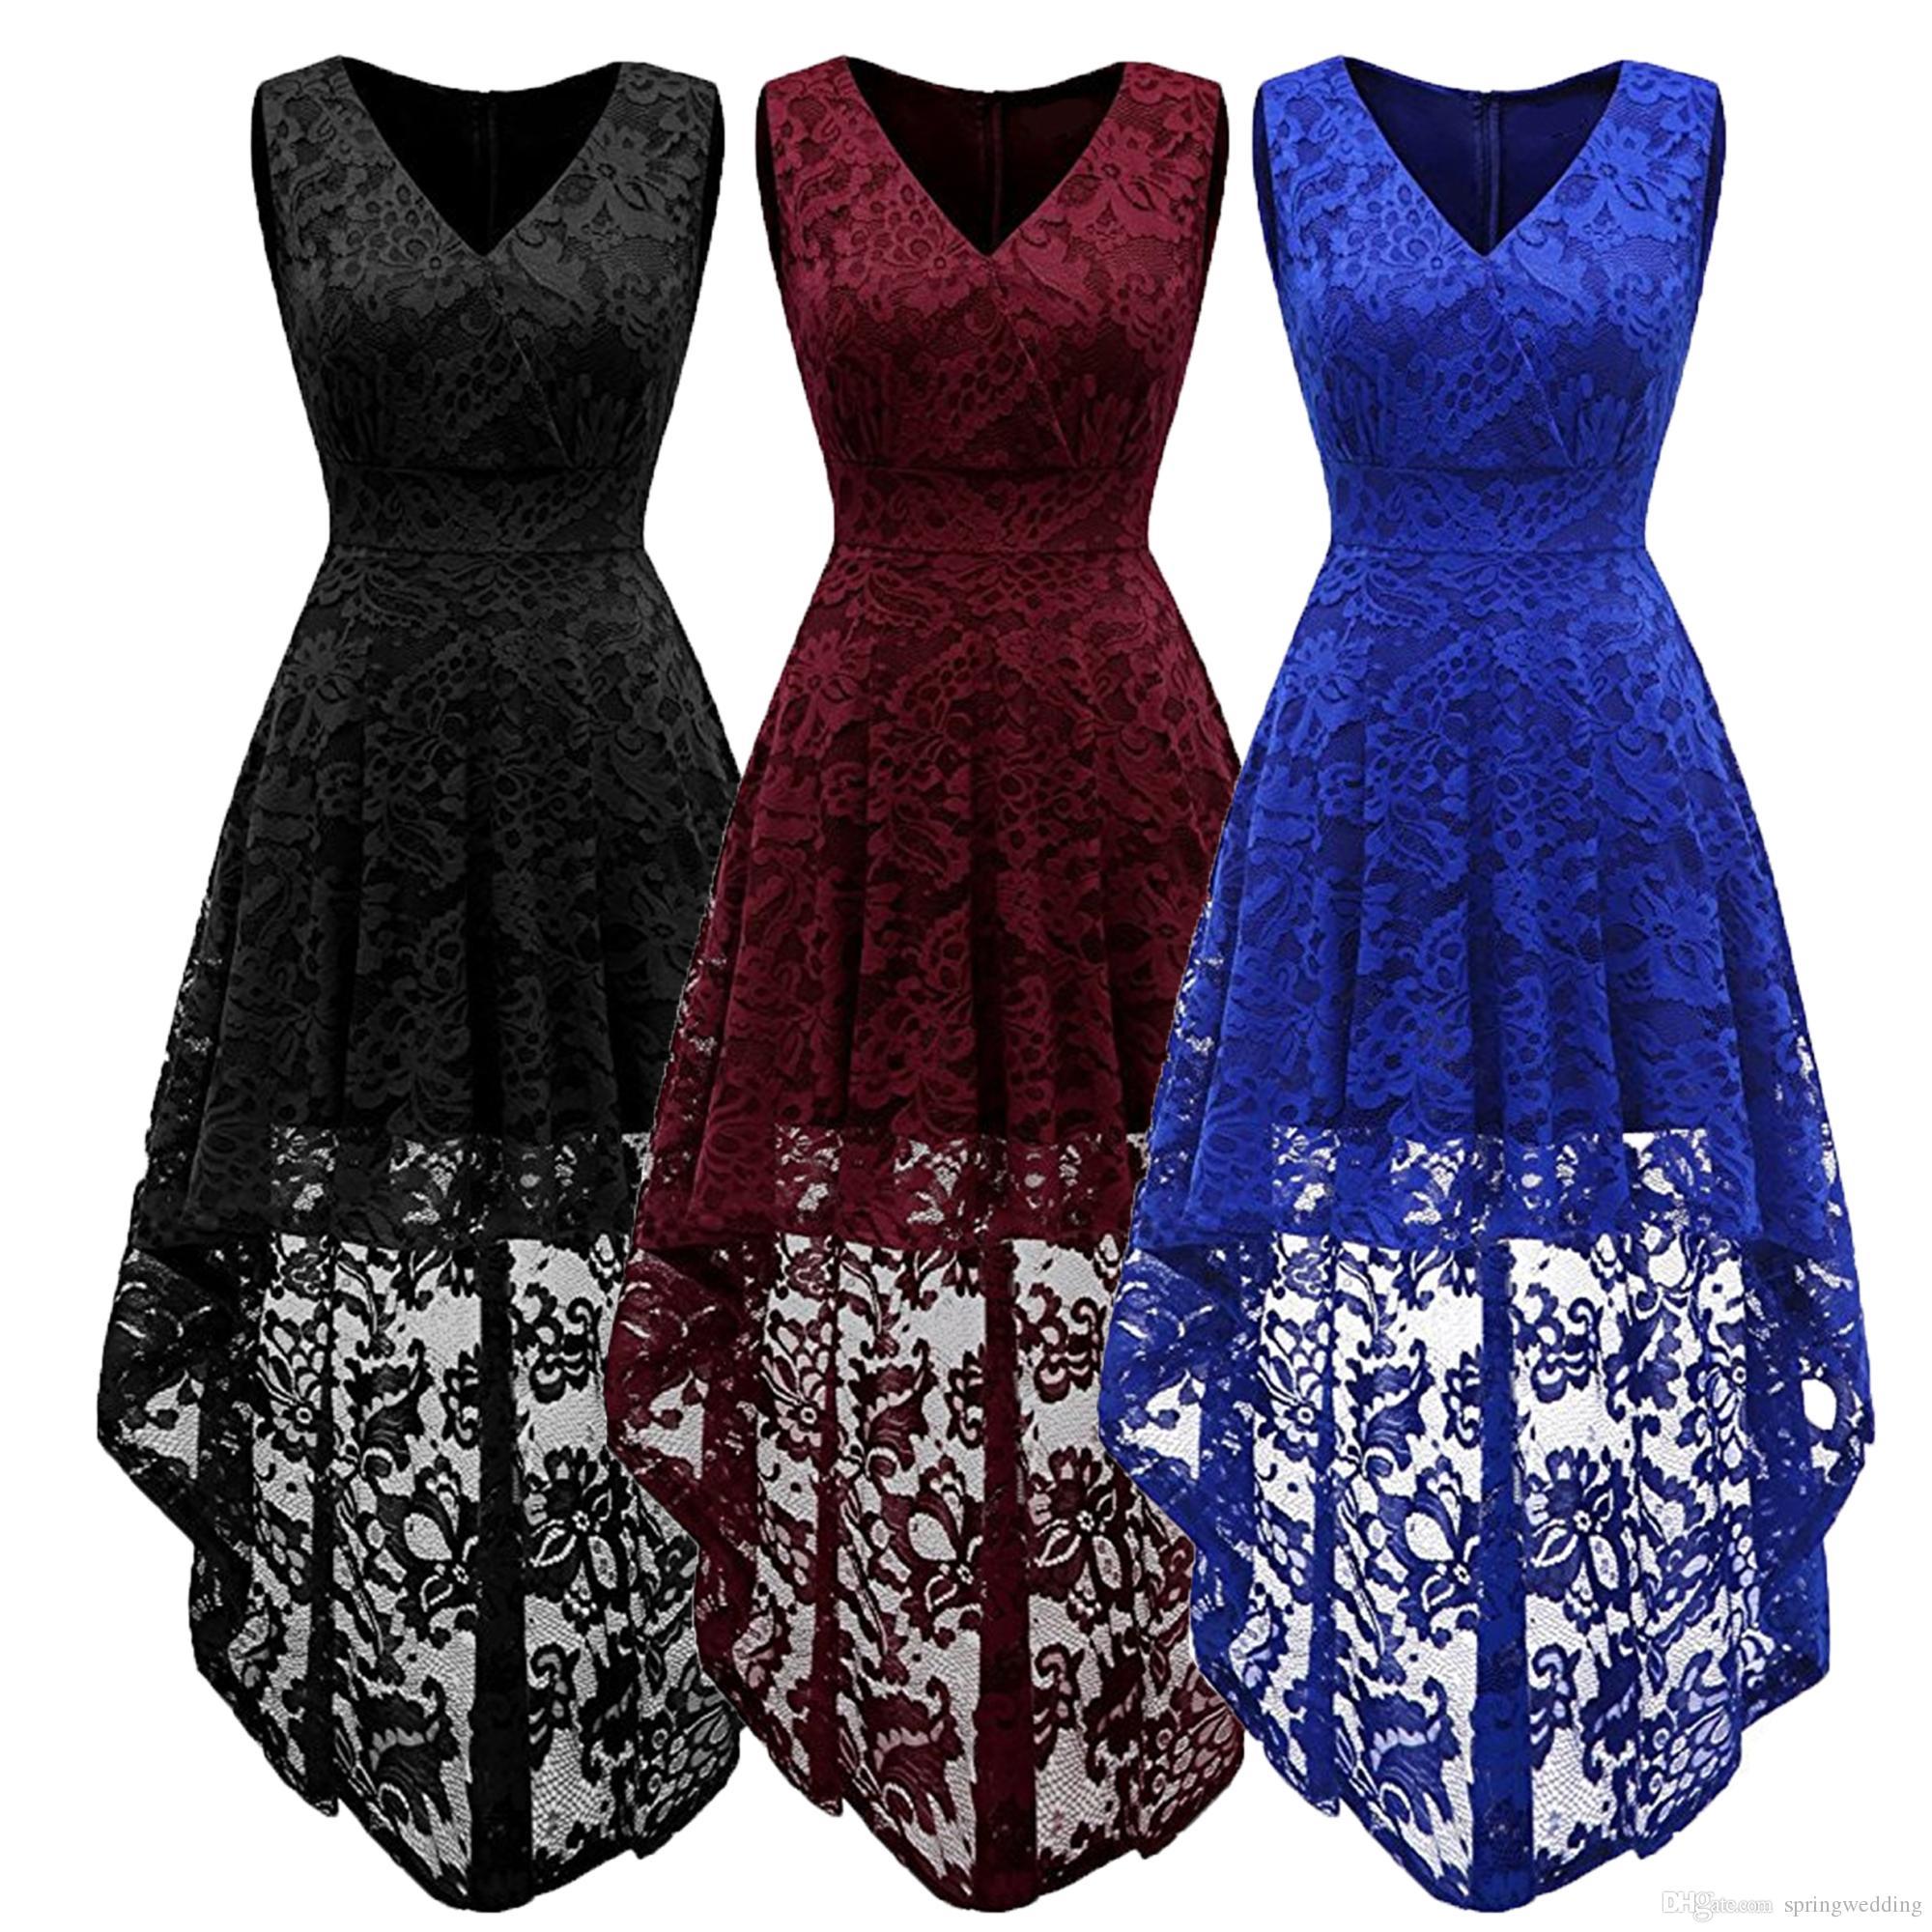 3f4ddc59876 Simple Cocktail Dresses Lace Short Front Long Back Dresses Elegant High Low  V Neckline 2018 Sexy Women Special Occasion Dress FS3896 Sundresses For  Sale ...